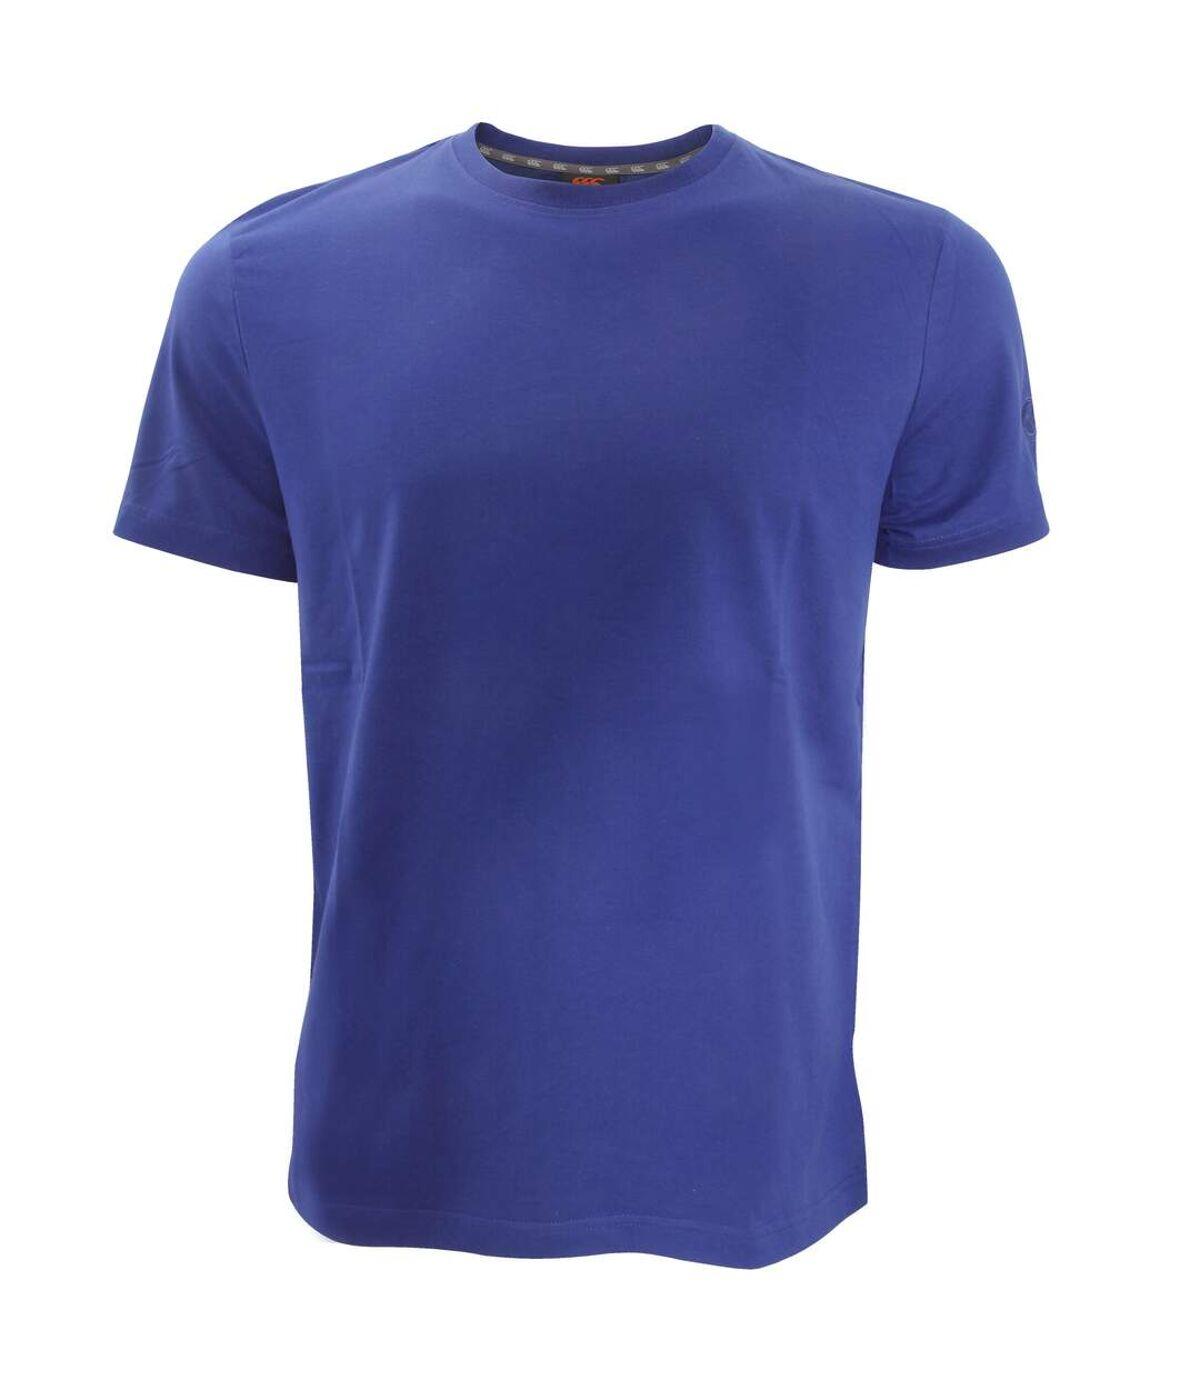 Canterbury Mens Team Plain Short Sleeve T-Shirt (Red) - UTPC2483